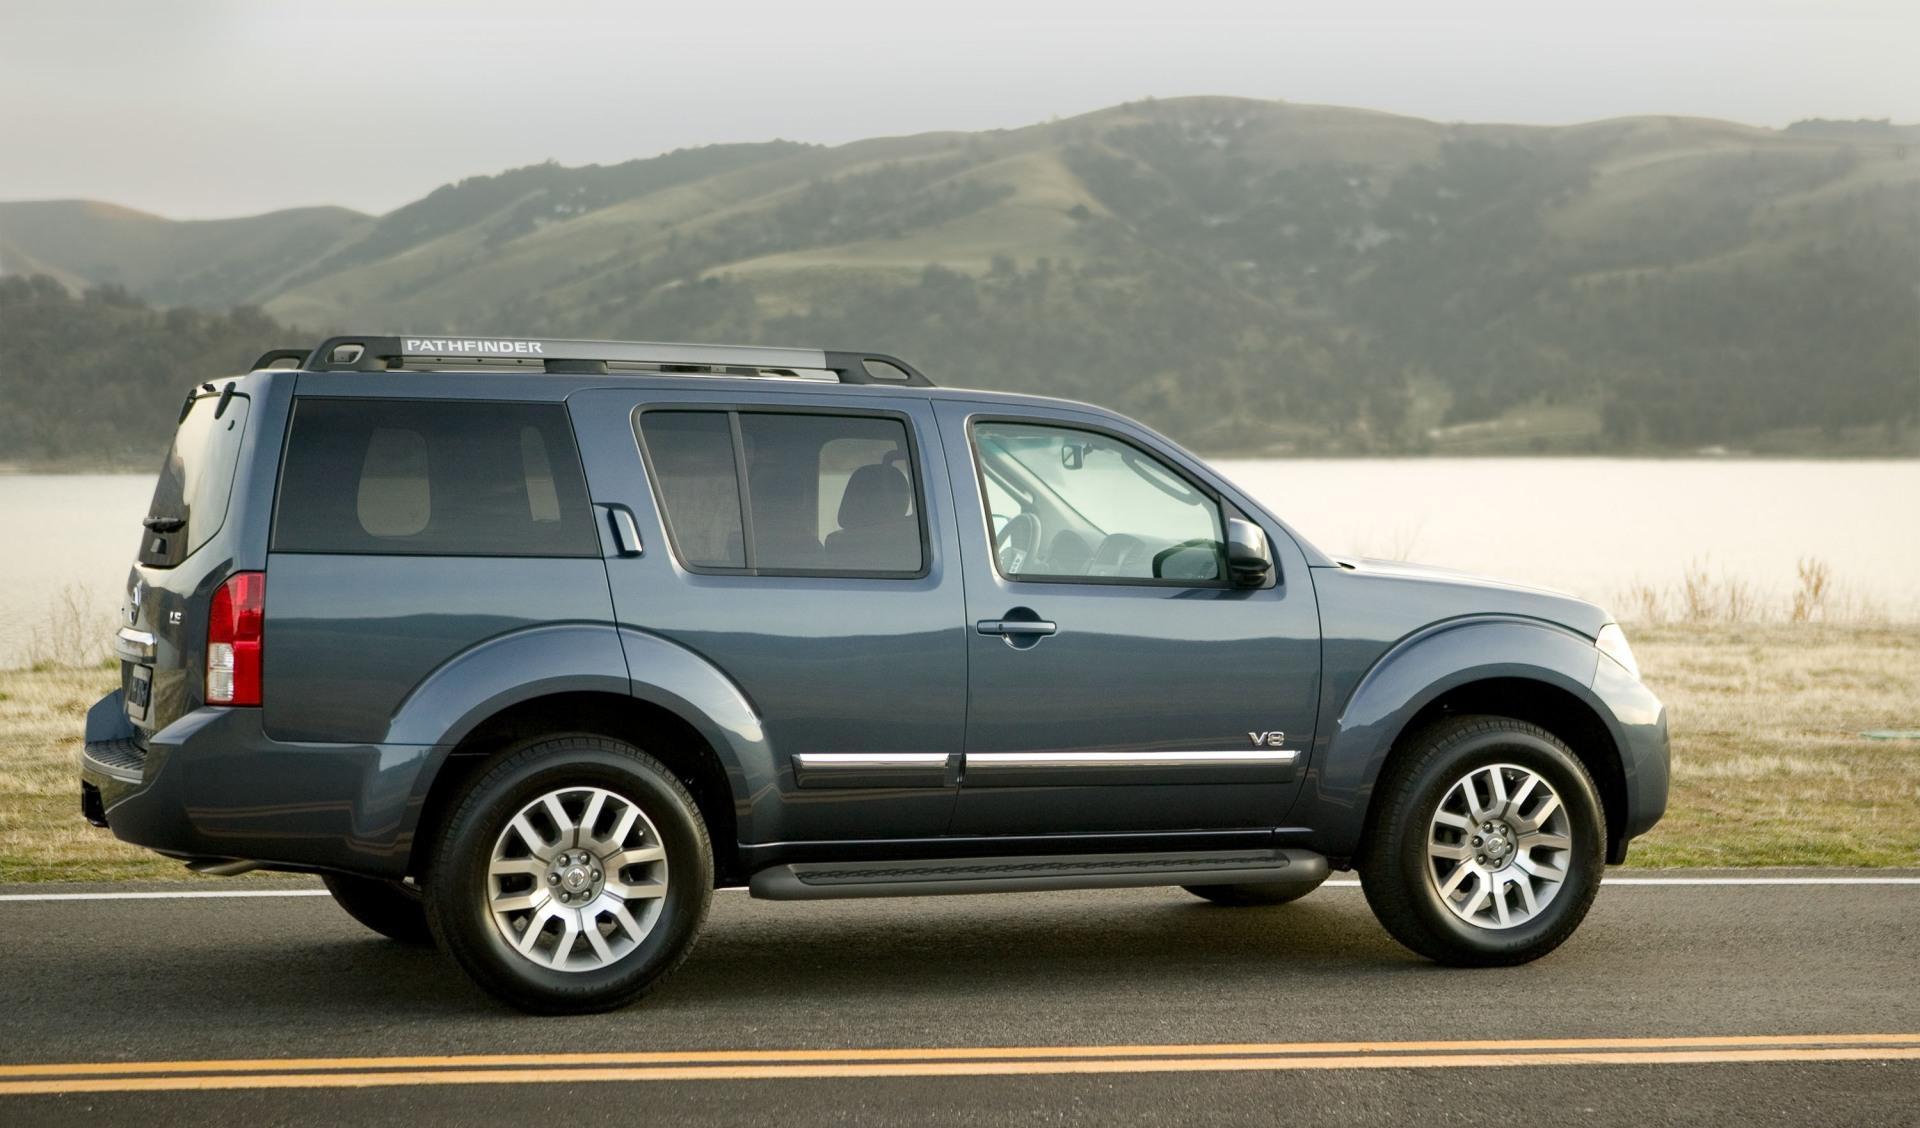 2009 Nissan Pathfinder News And Information Conceptcarz Com